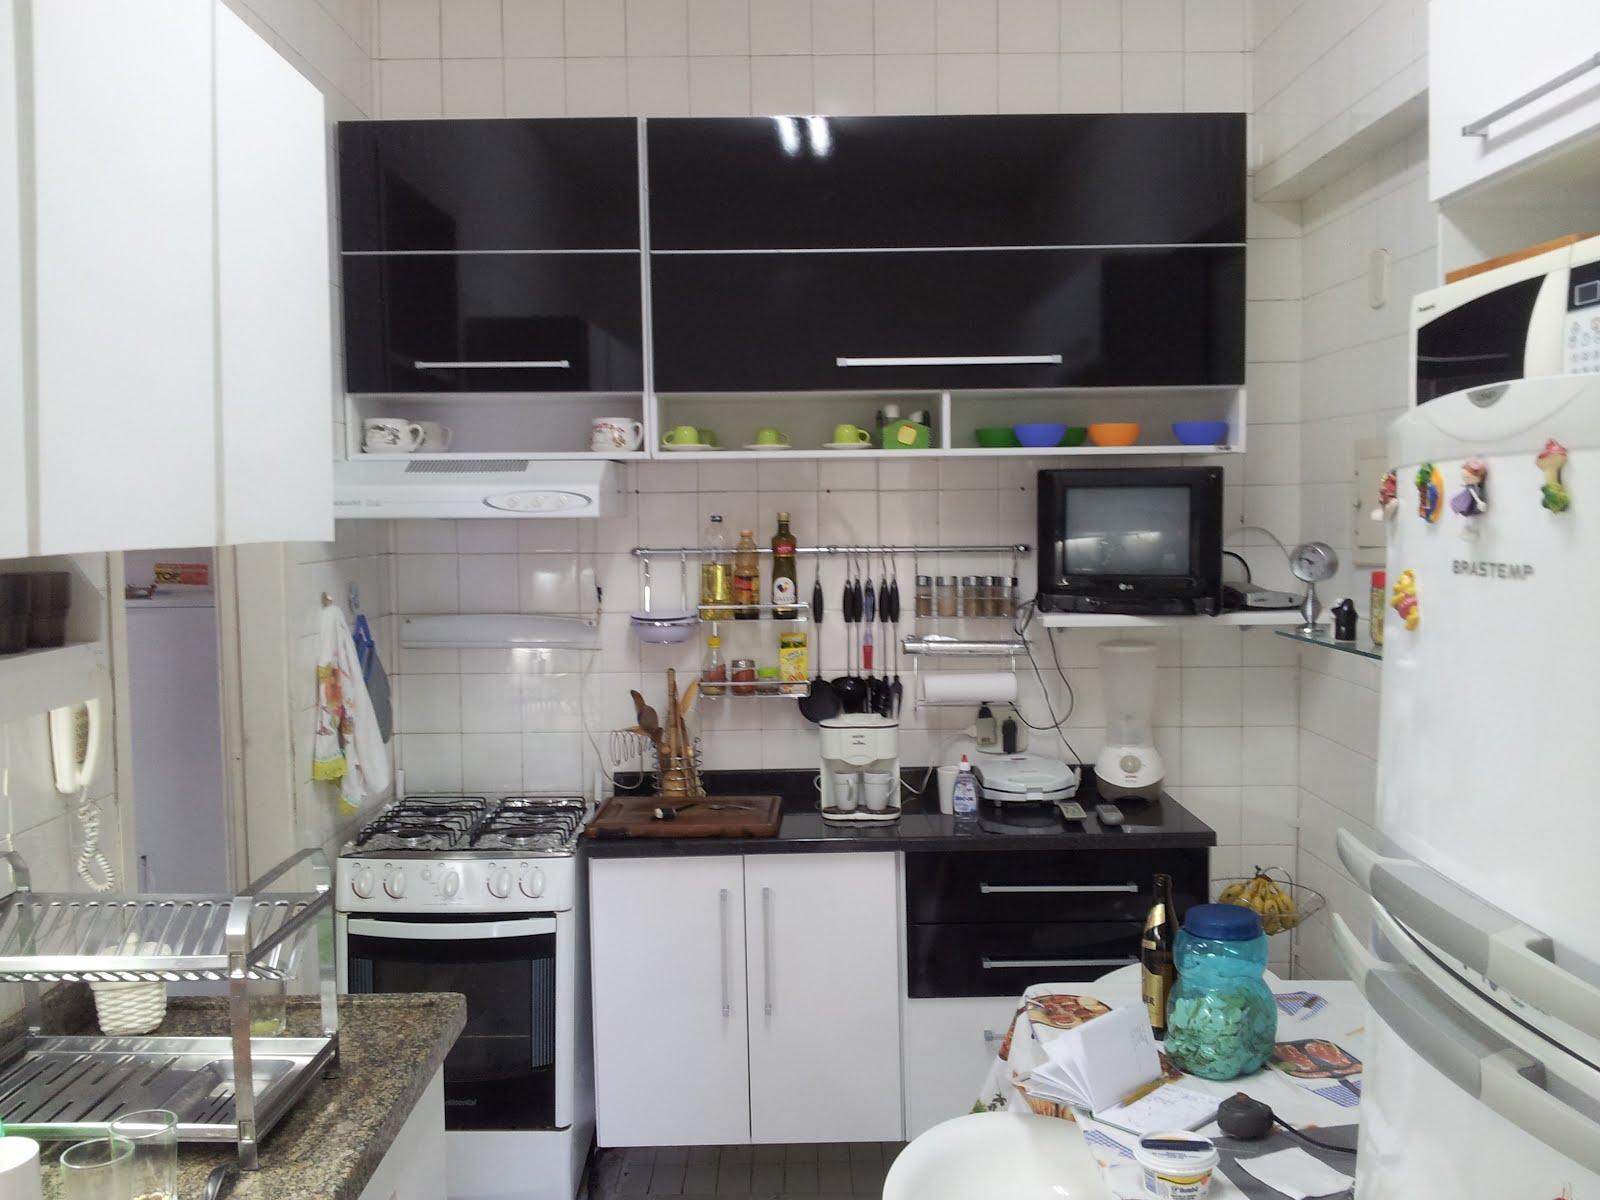 .blogspot.com/ ReginaSegura. arquitetura: Reforma de Cozinha Tijuca #477376 1600 1200